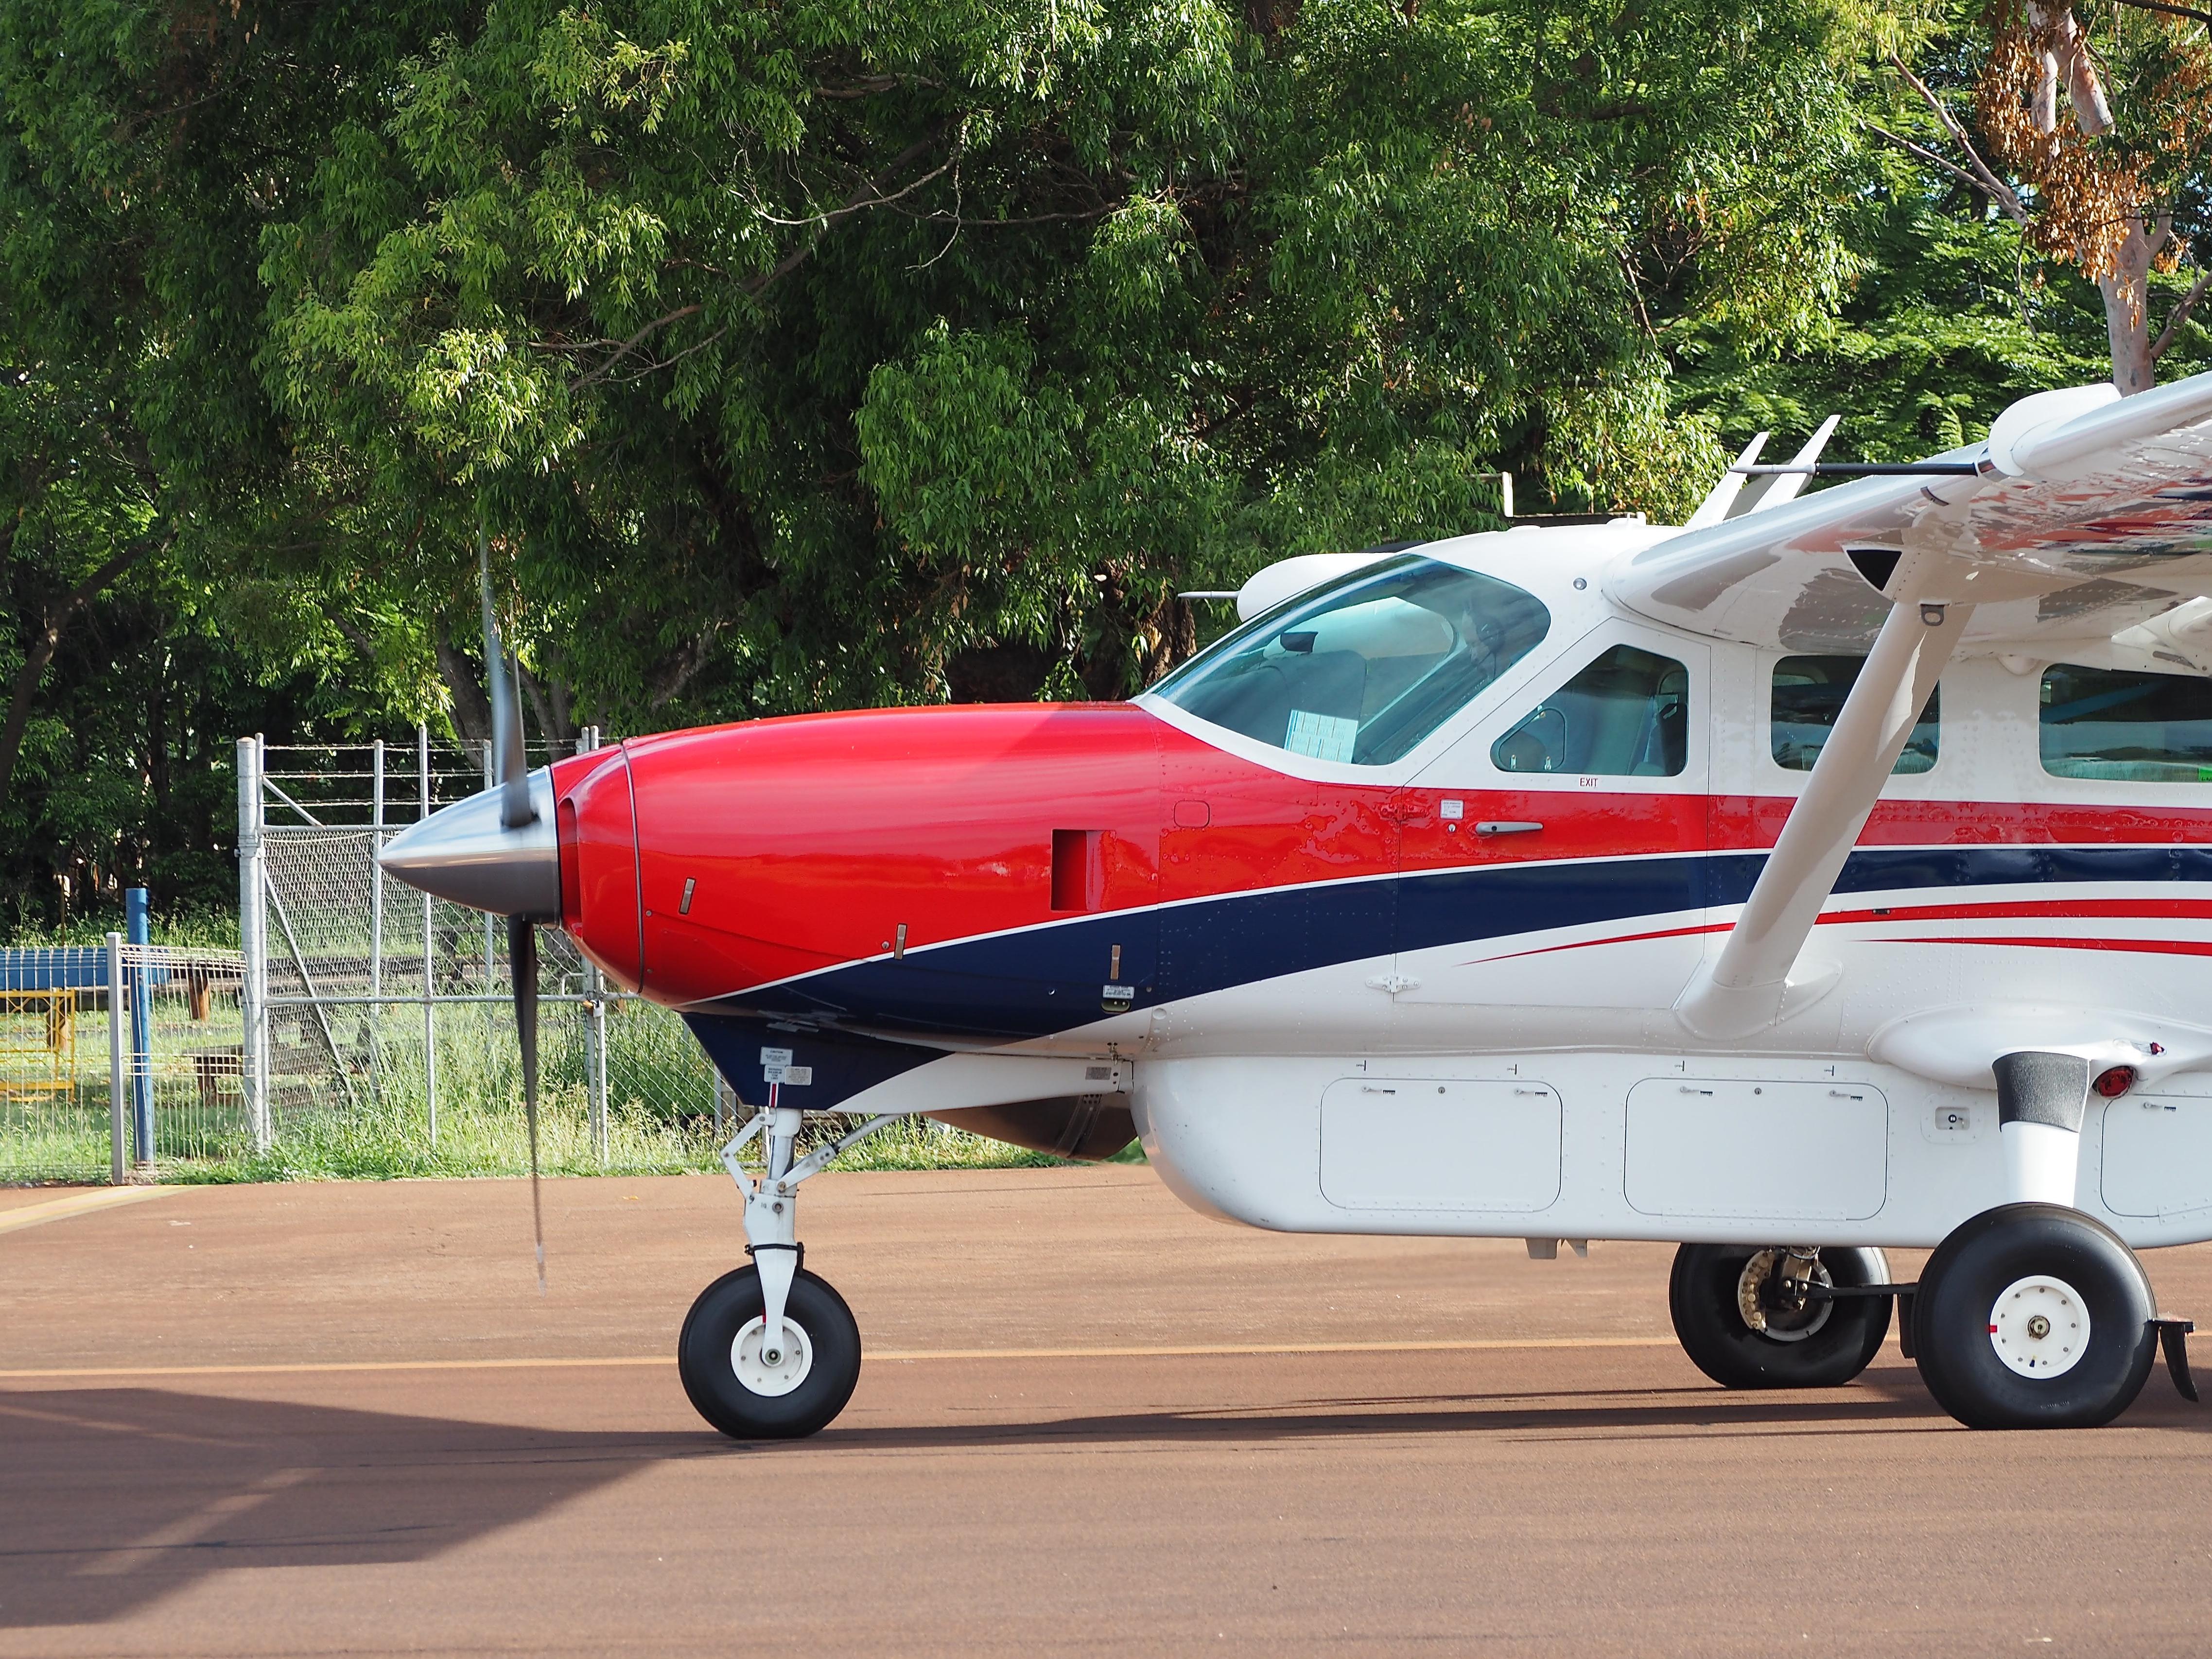 A brand new Cessna Caravan arrives for service in Mareeba